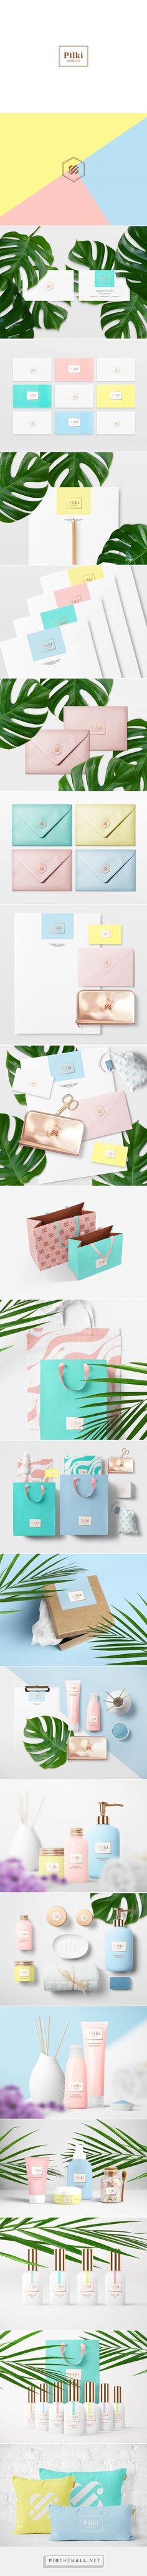 Pilki Nail Care Salon Branding and Packaging by Rina Rusyaeva